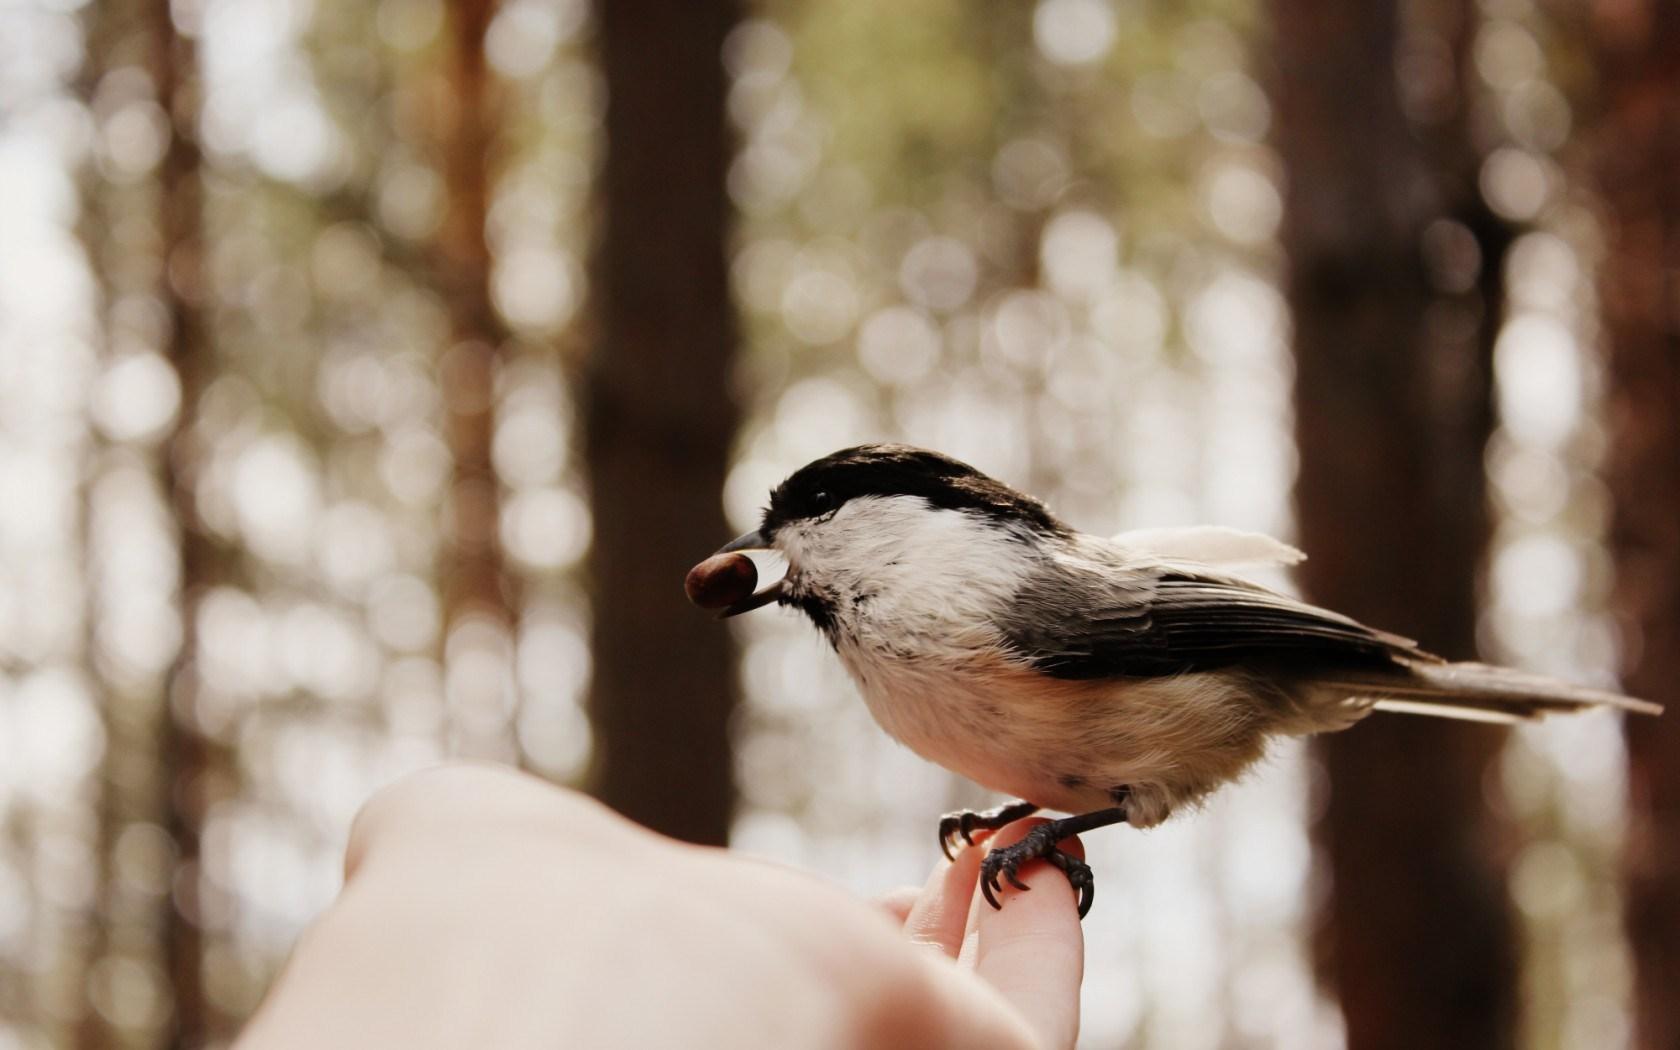 bird in hand 39528